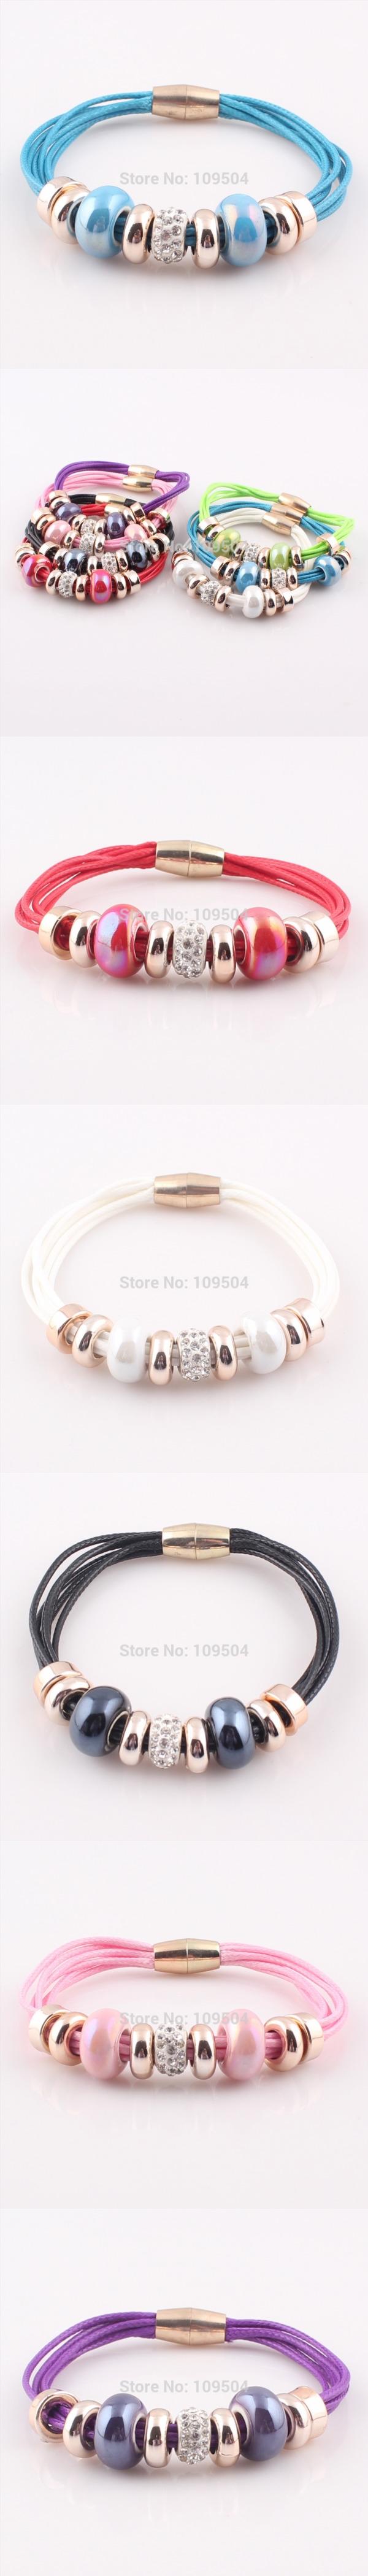 Bracelet wholesale new fashion jewelry leather bracelet for